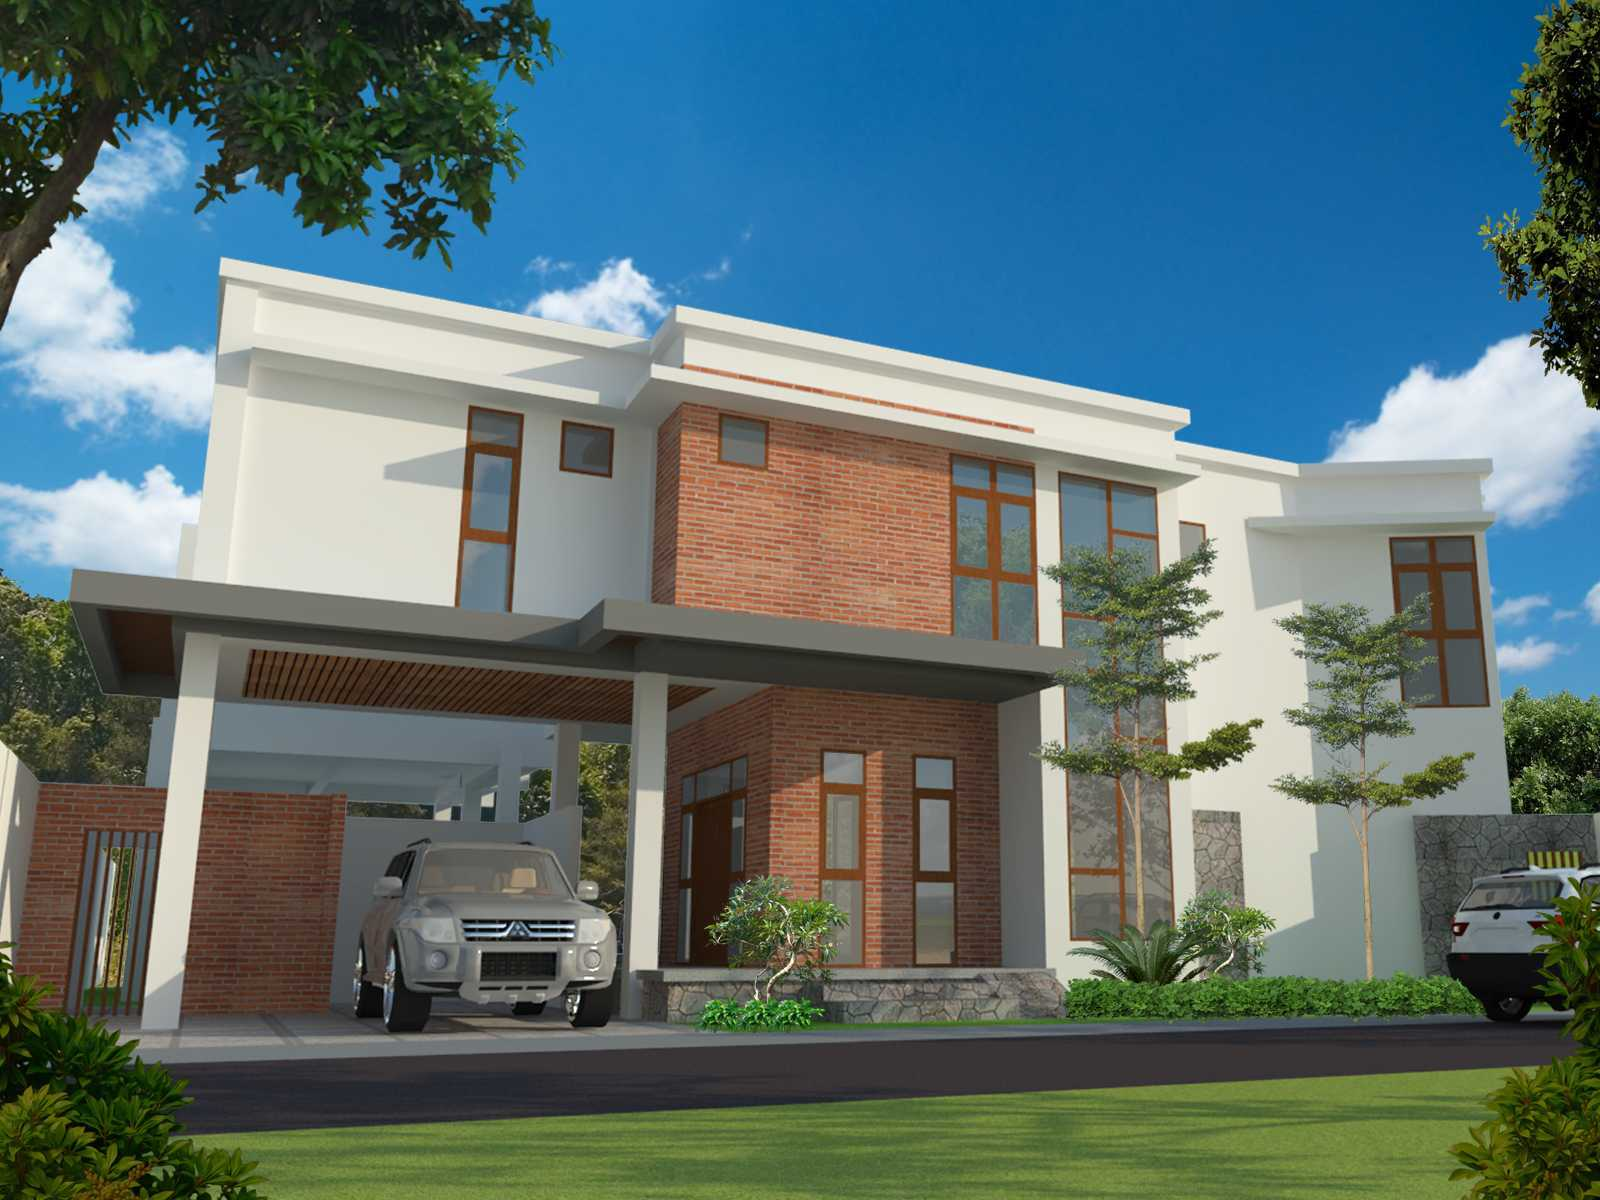 Epicnesia Architect Villa Mahabali Kediri, Kabupaten Tabanan, Bali, Indonesia Kediri, Kabupaten Tabanan, Bali, Indonesia Aditya-Yuni-Prasetya-Villa-Mahabali  68051